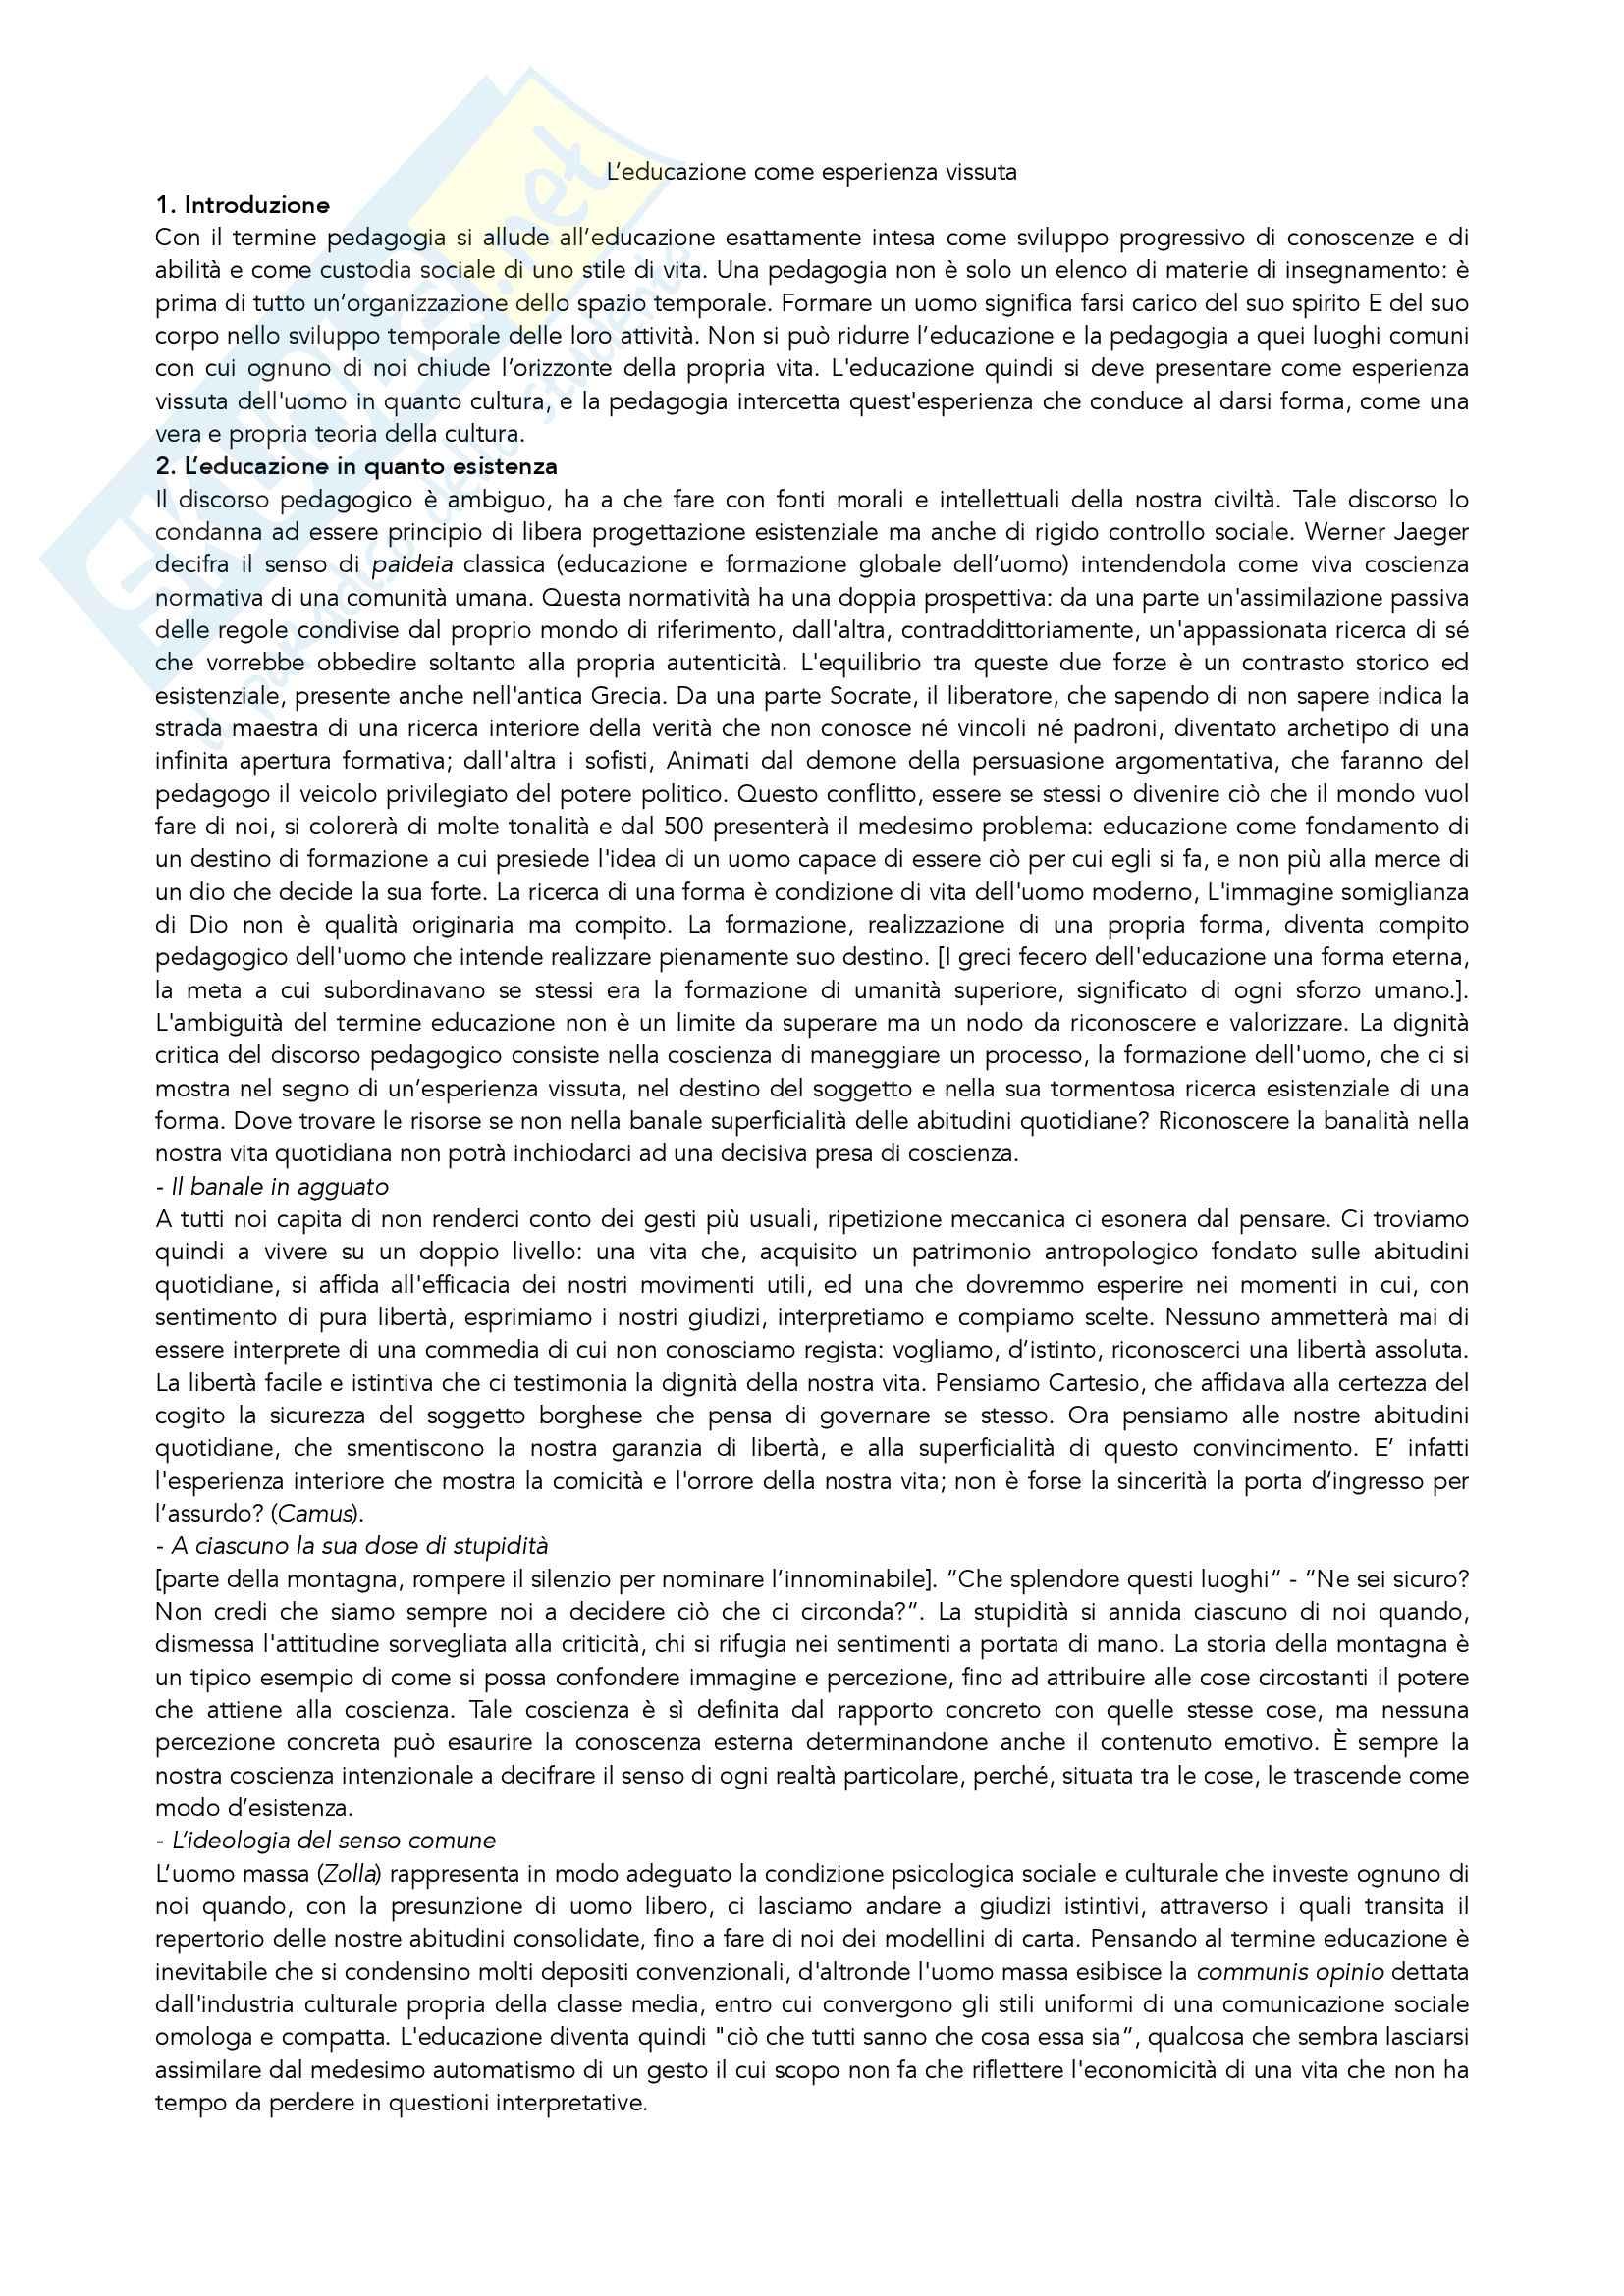 "Riassunto esame pedagogia generale, prof. Madrussan, testo consigliato ""Educazione come esperienza vissuta"", Madrussan"